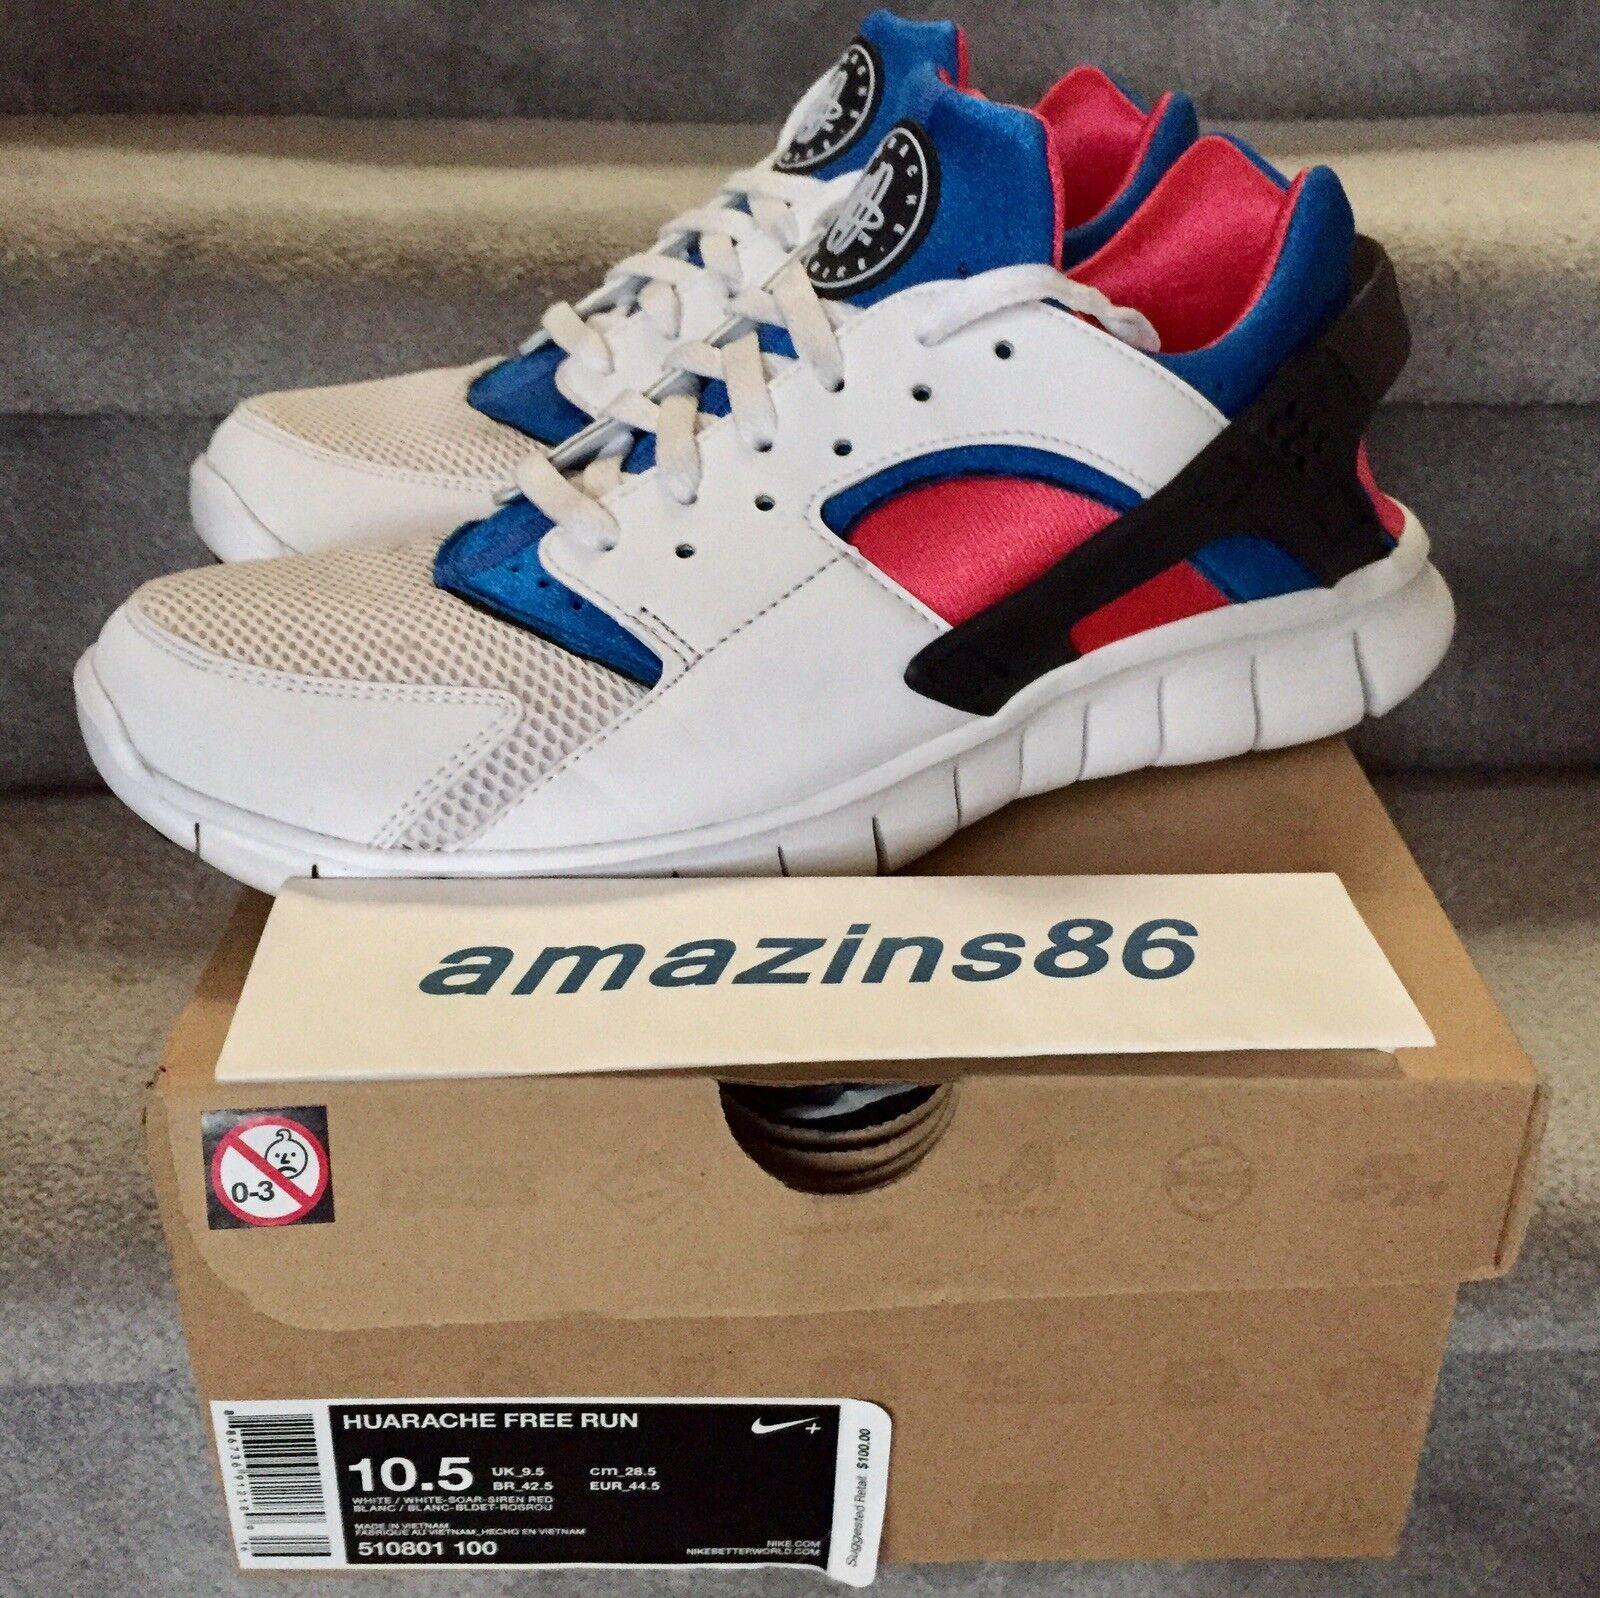 Nike HUARACHE FREE RUN White Soar Siren Red Size 10.5 PRE-OWNED with Orig. Box